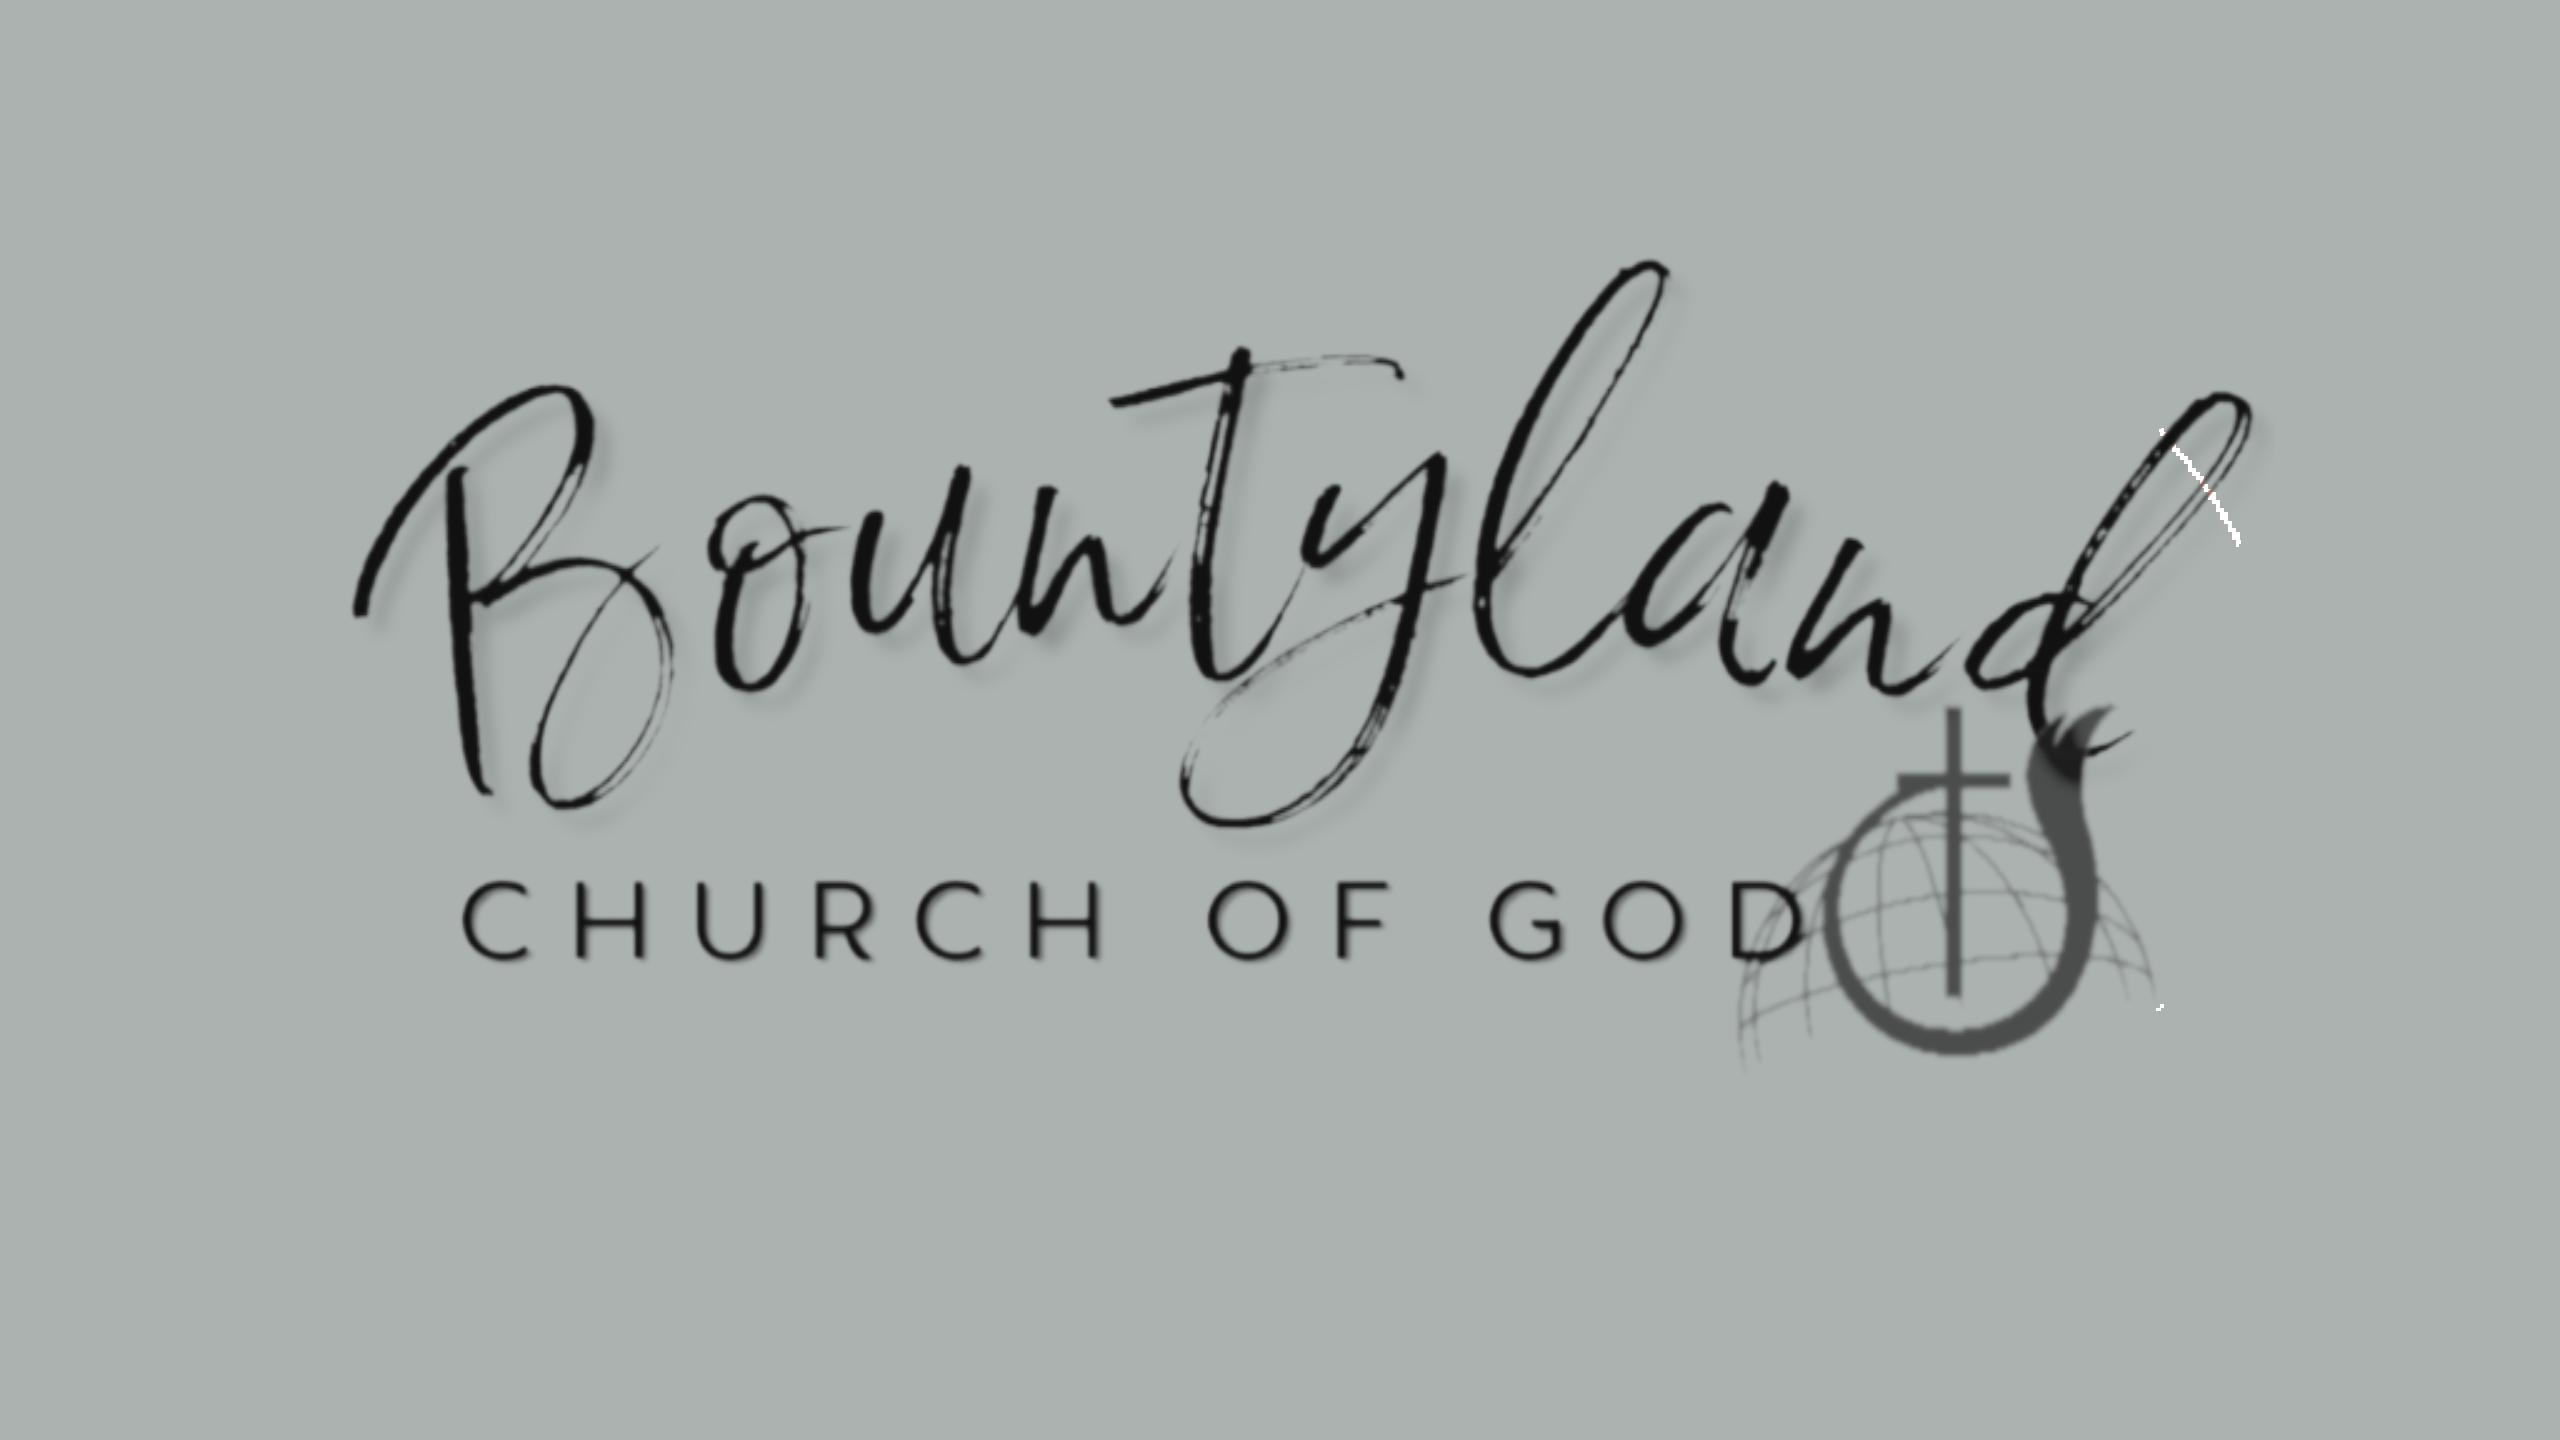 Bountyland Church of God